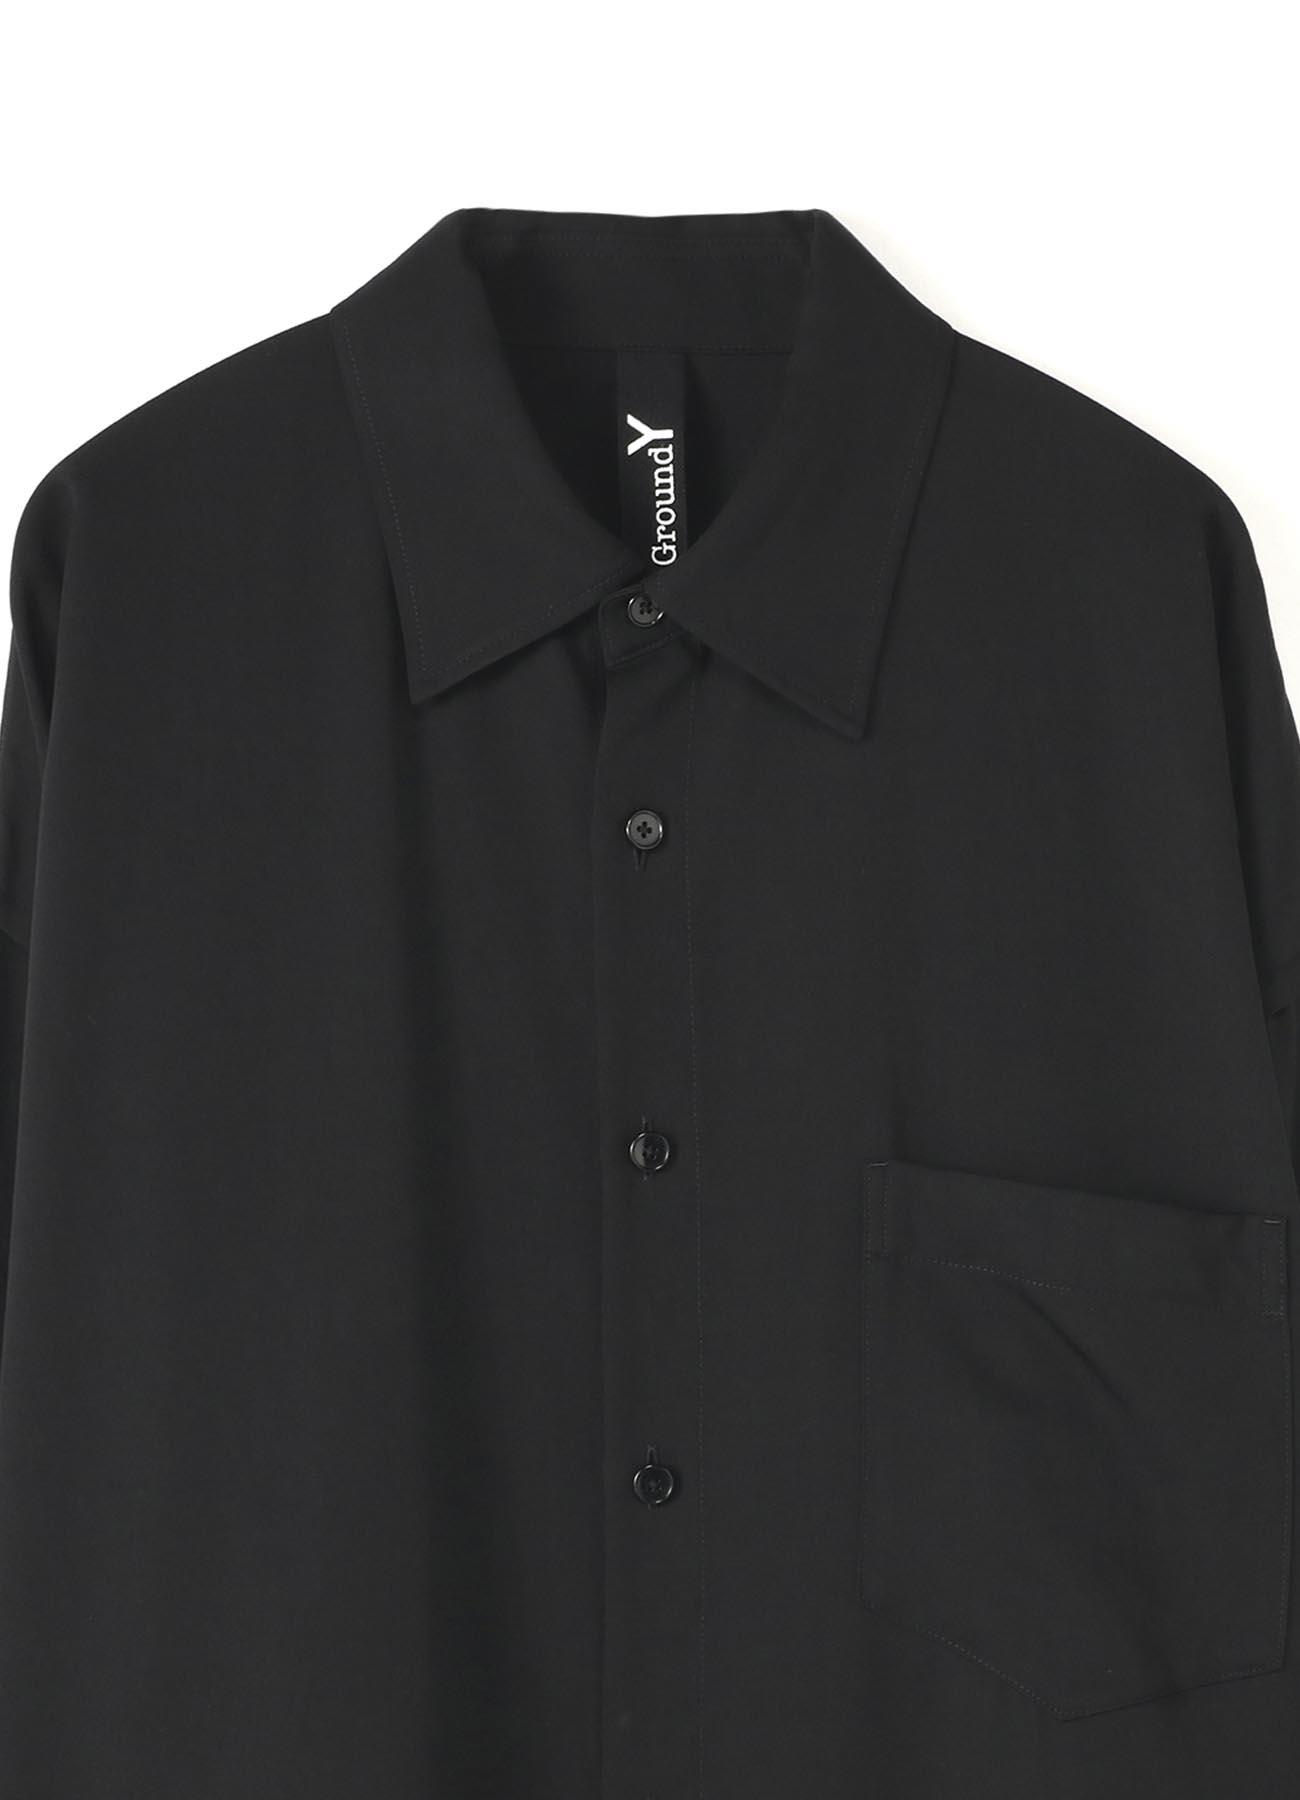 TE/Burberry French Seam Semi Long Shirt